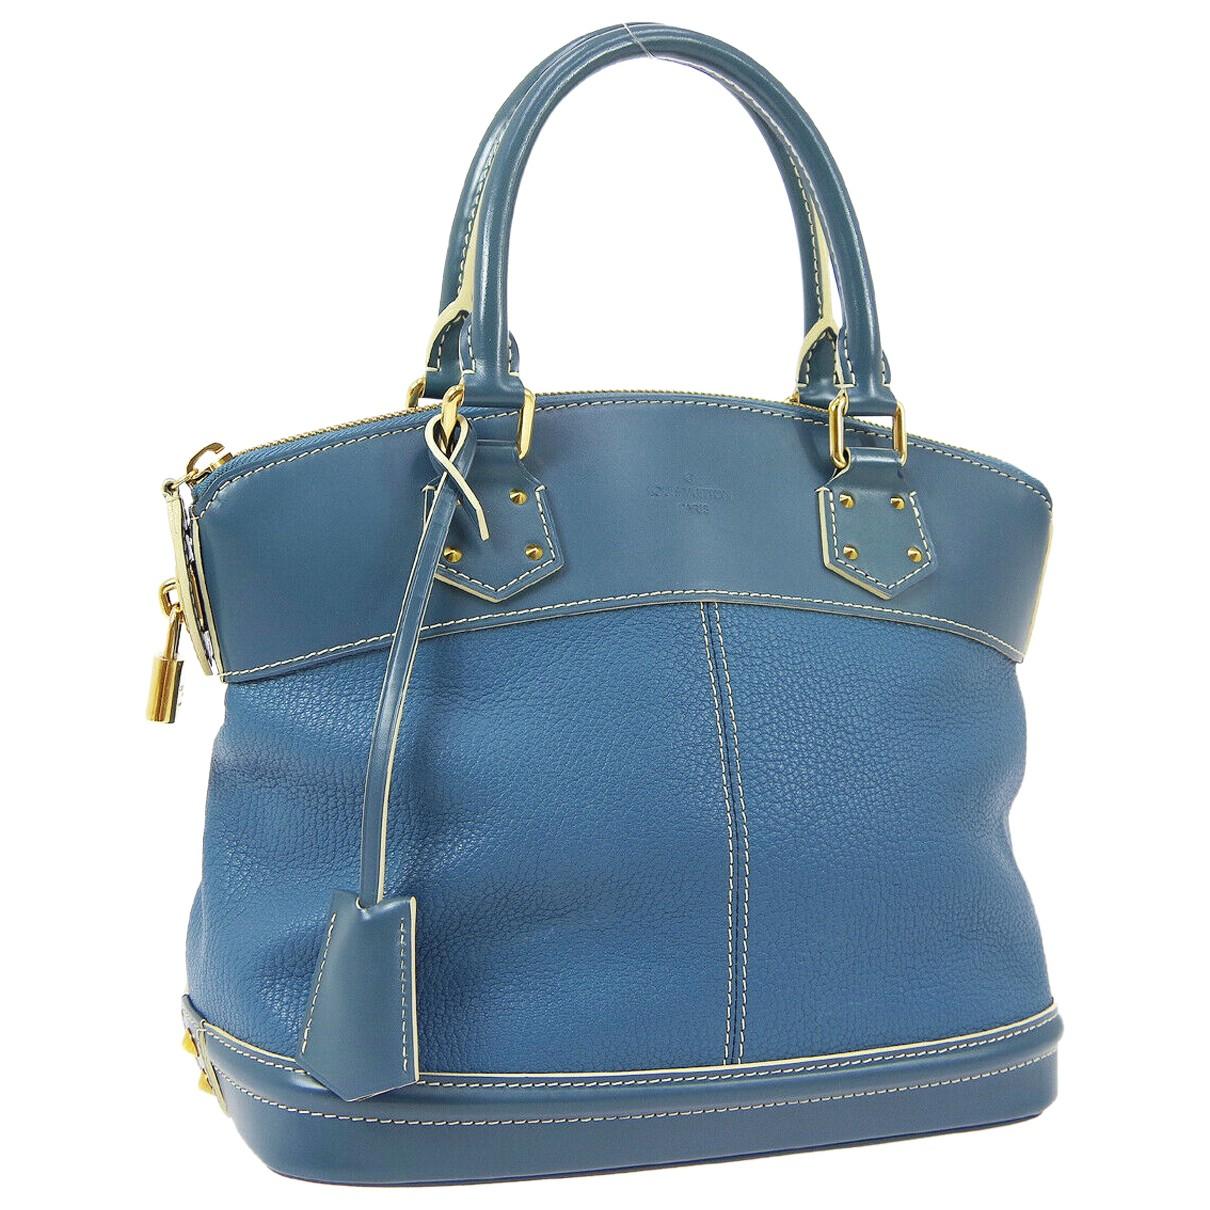 Louis Vuitton - Sac a main Lockit pour femme en cuir - bleu